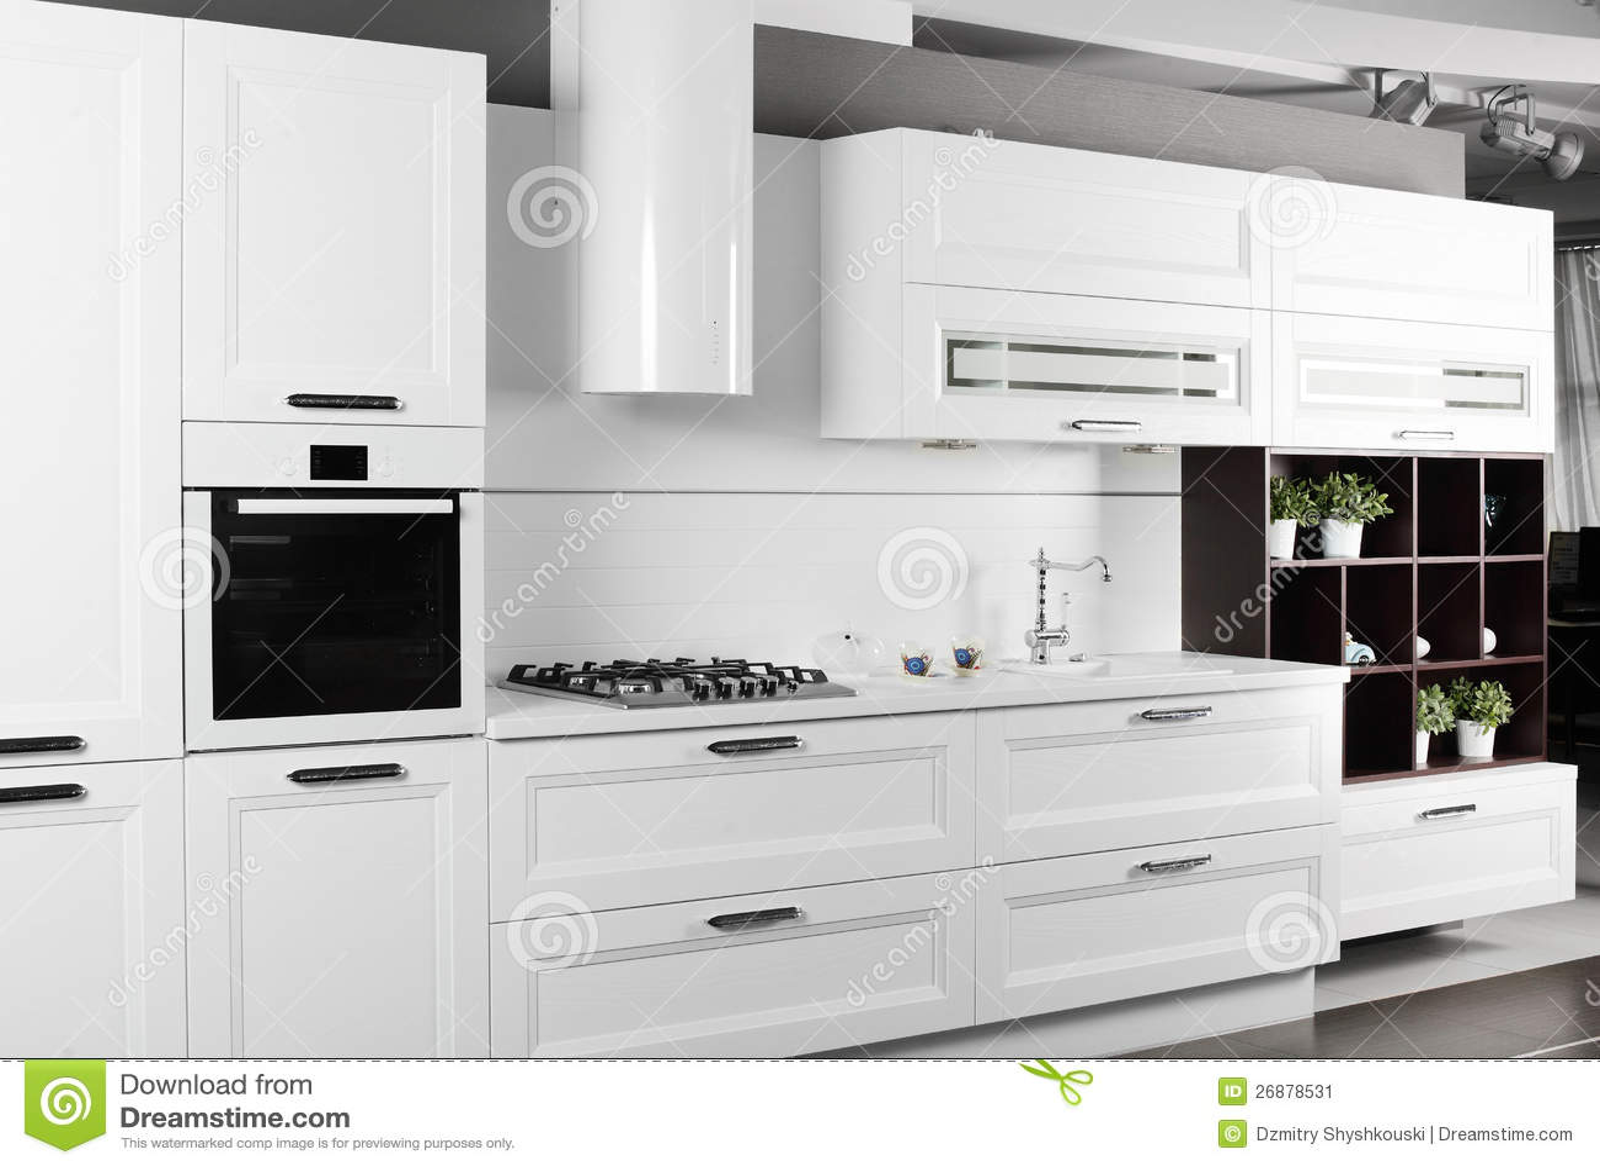 european kitchens white kitchen bar stools 明亮的全新的欧洲厨房库存图片 图片包括有任何地方 家具 房子 豪宅 明亮的全新的欧洲厨房